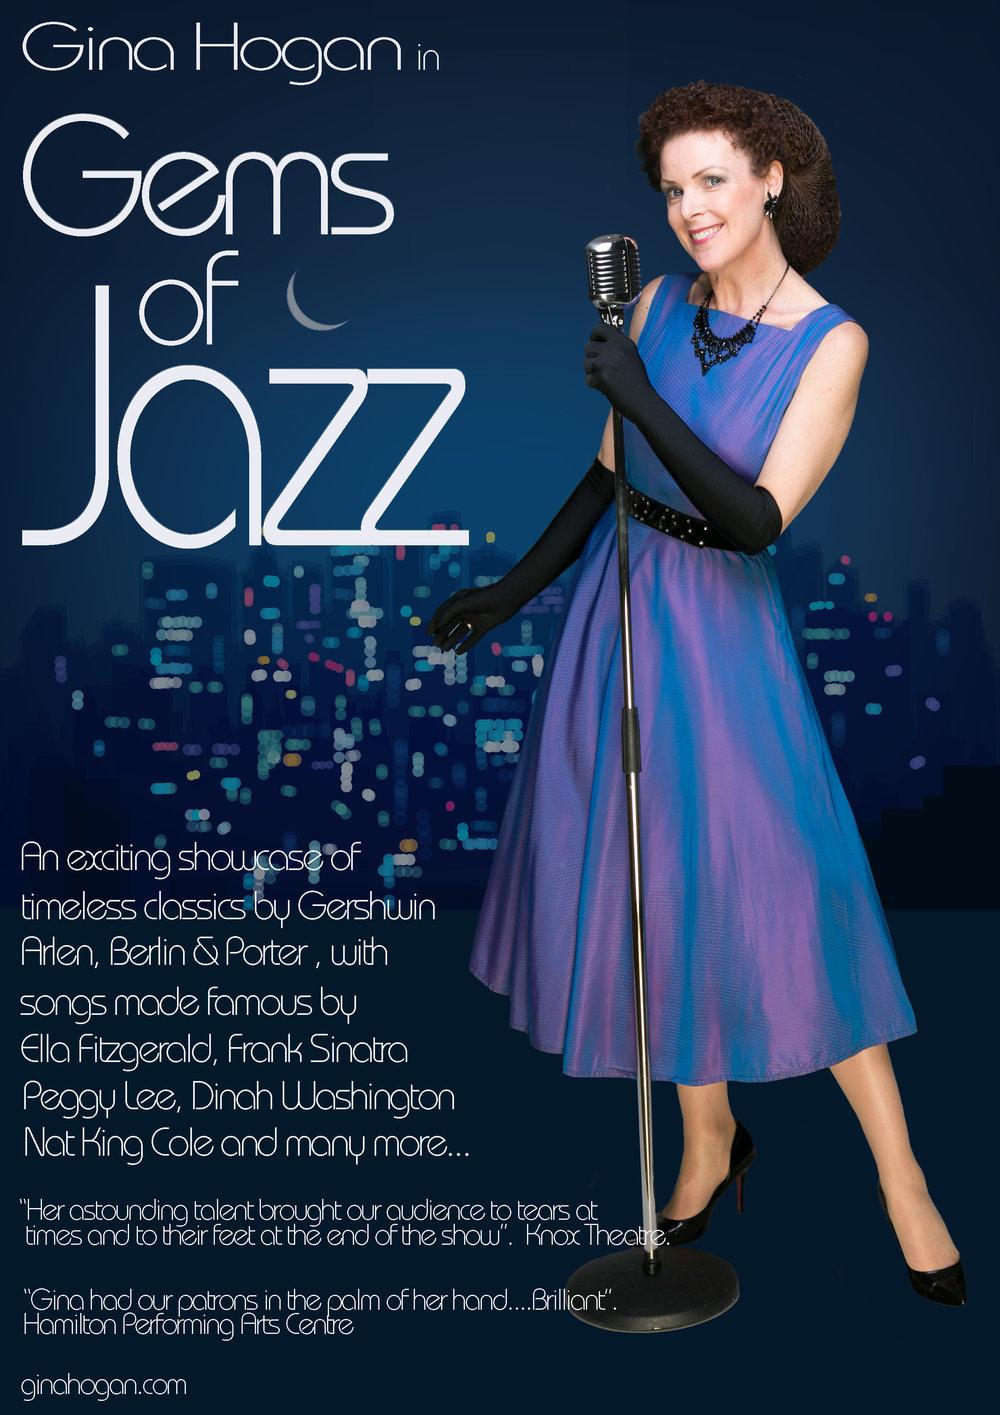 Gems of Jazz Poster JPG.jpg